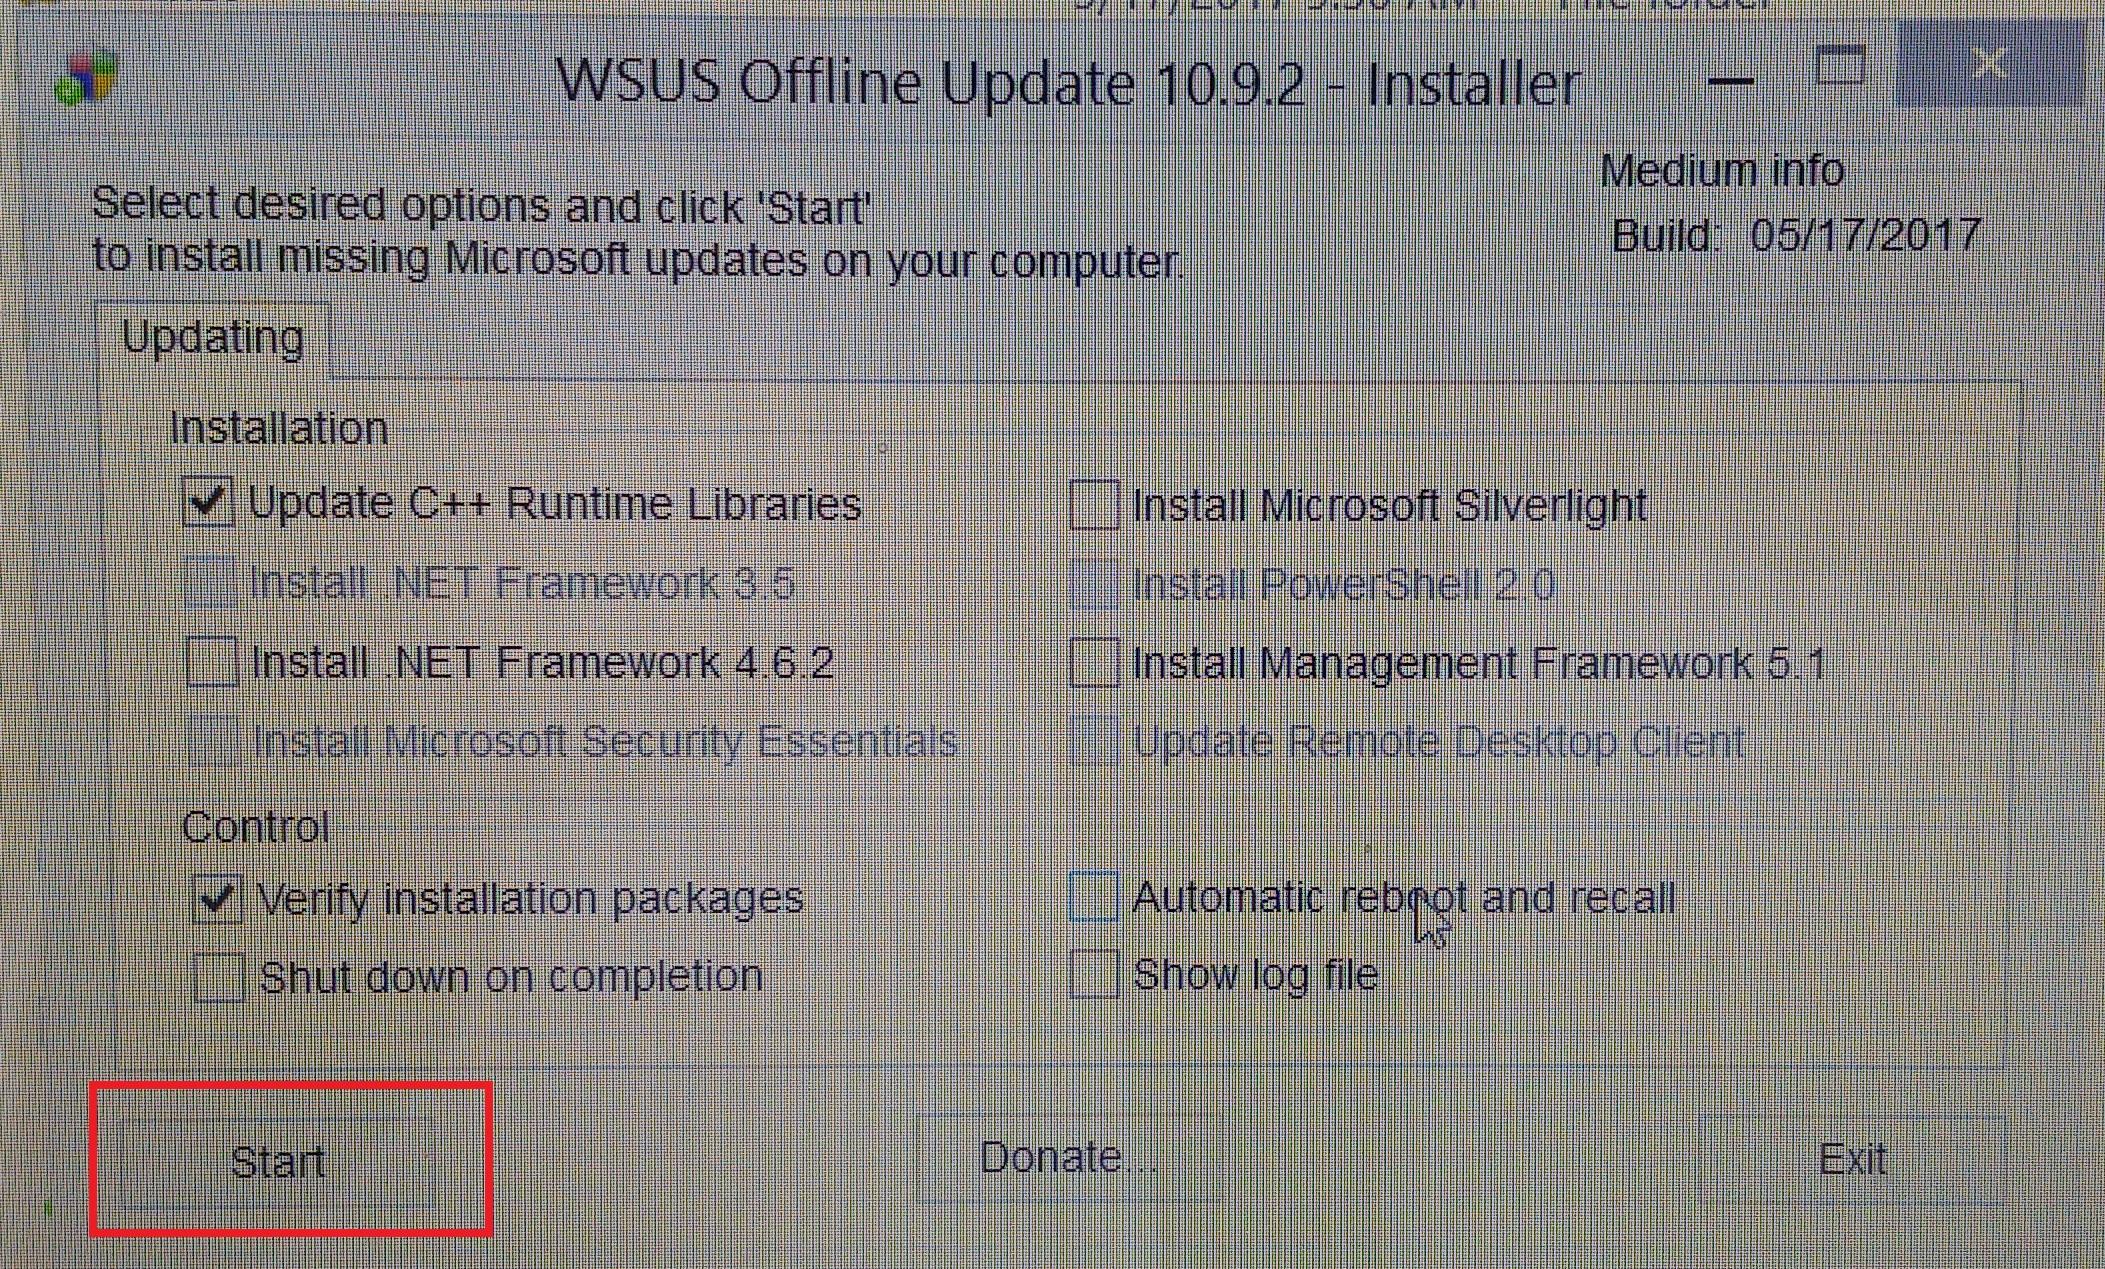 Fixing a Frozen Windows Update – Busix Documentation